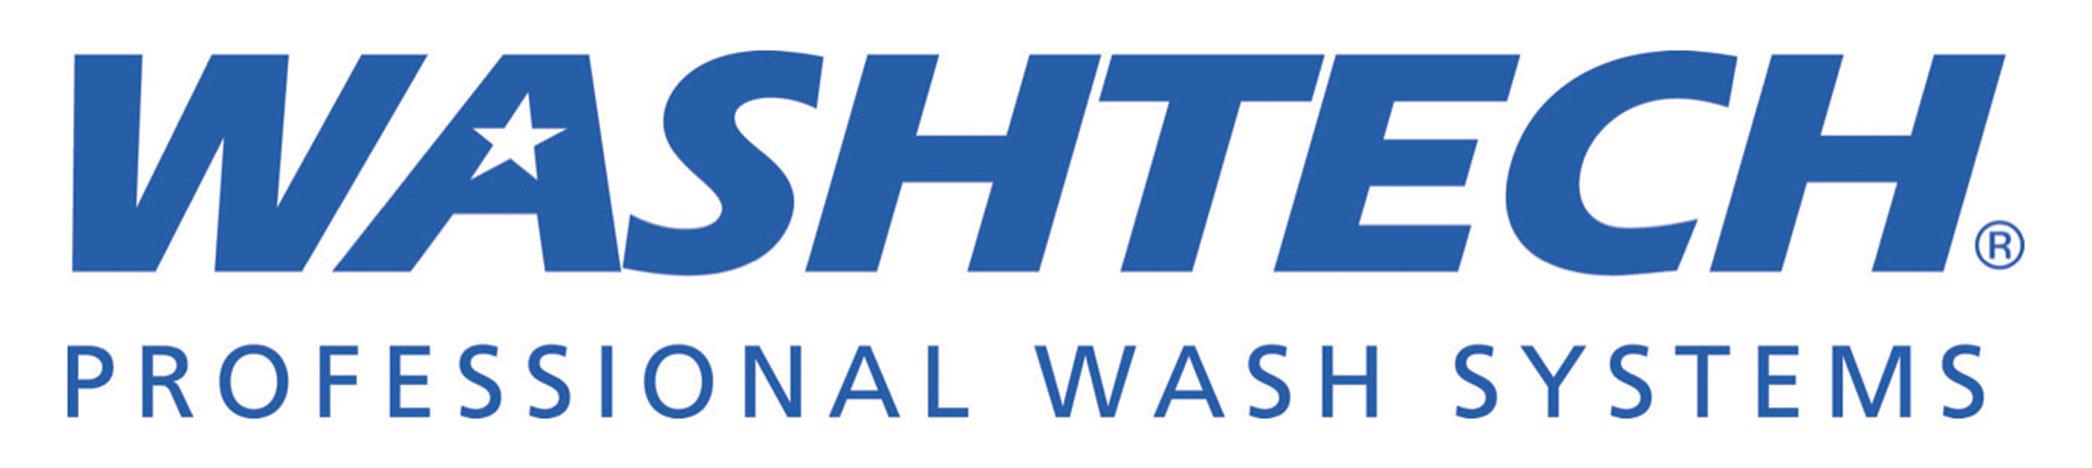 washtech-banner.jpg